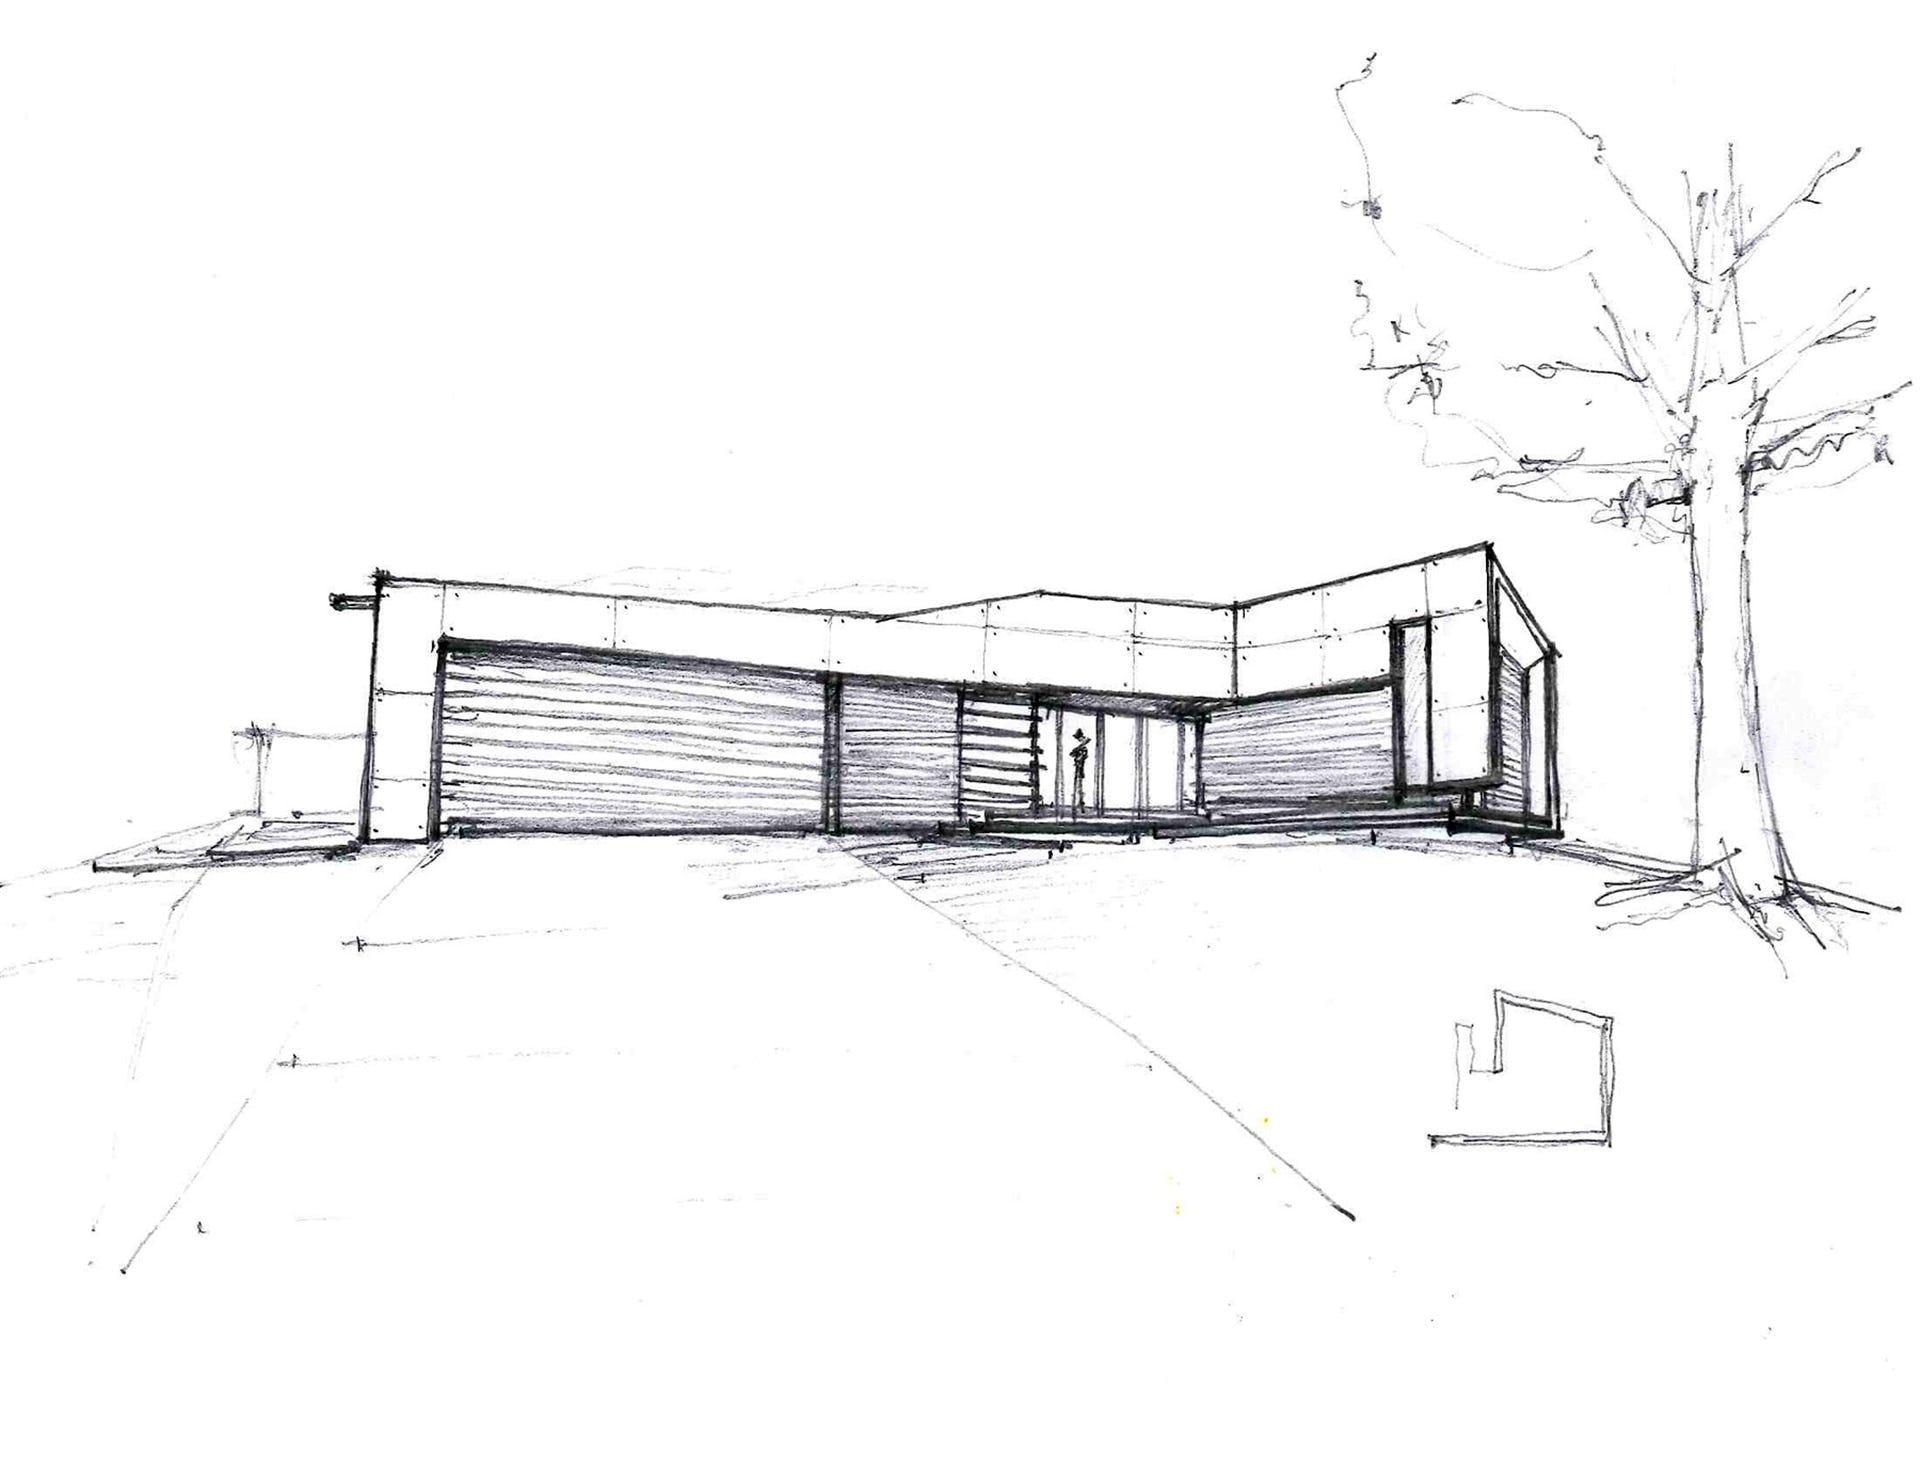 Modus studio 560 vinson sketch 01